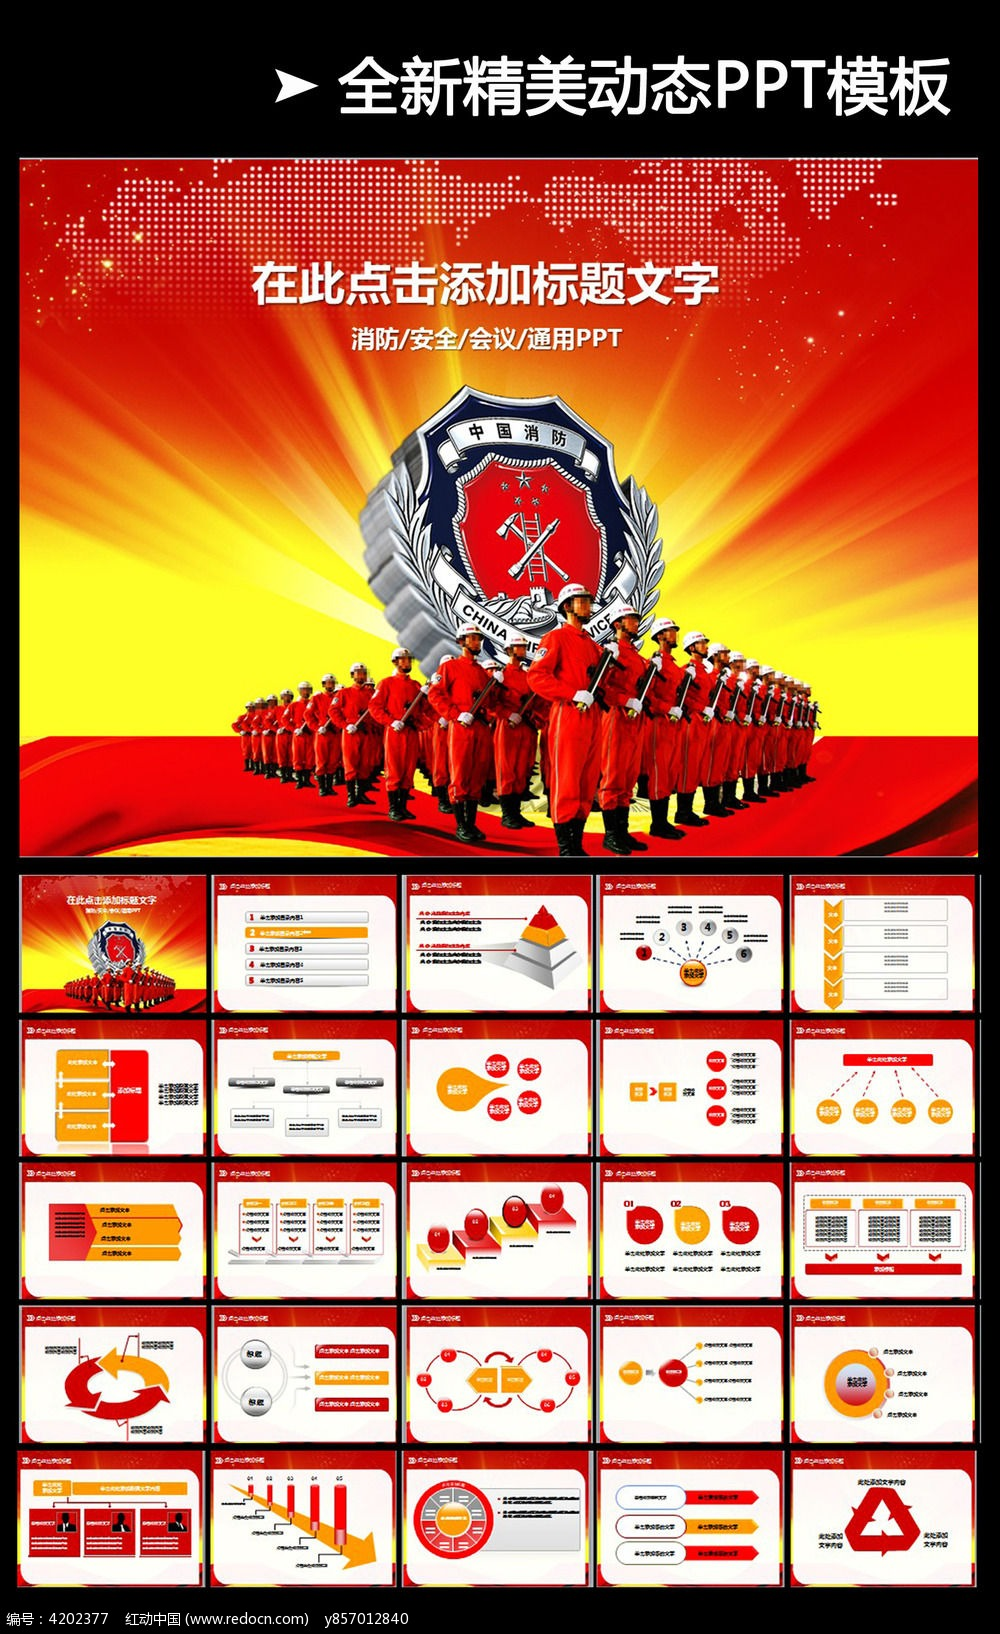 119消防安全ppt模板